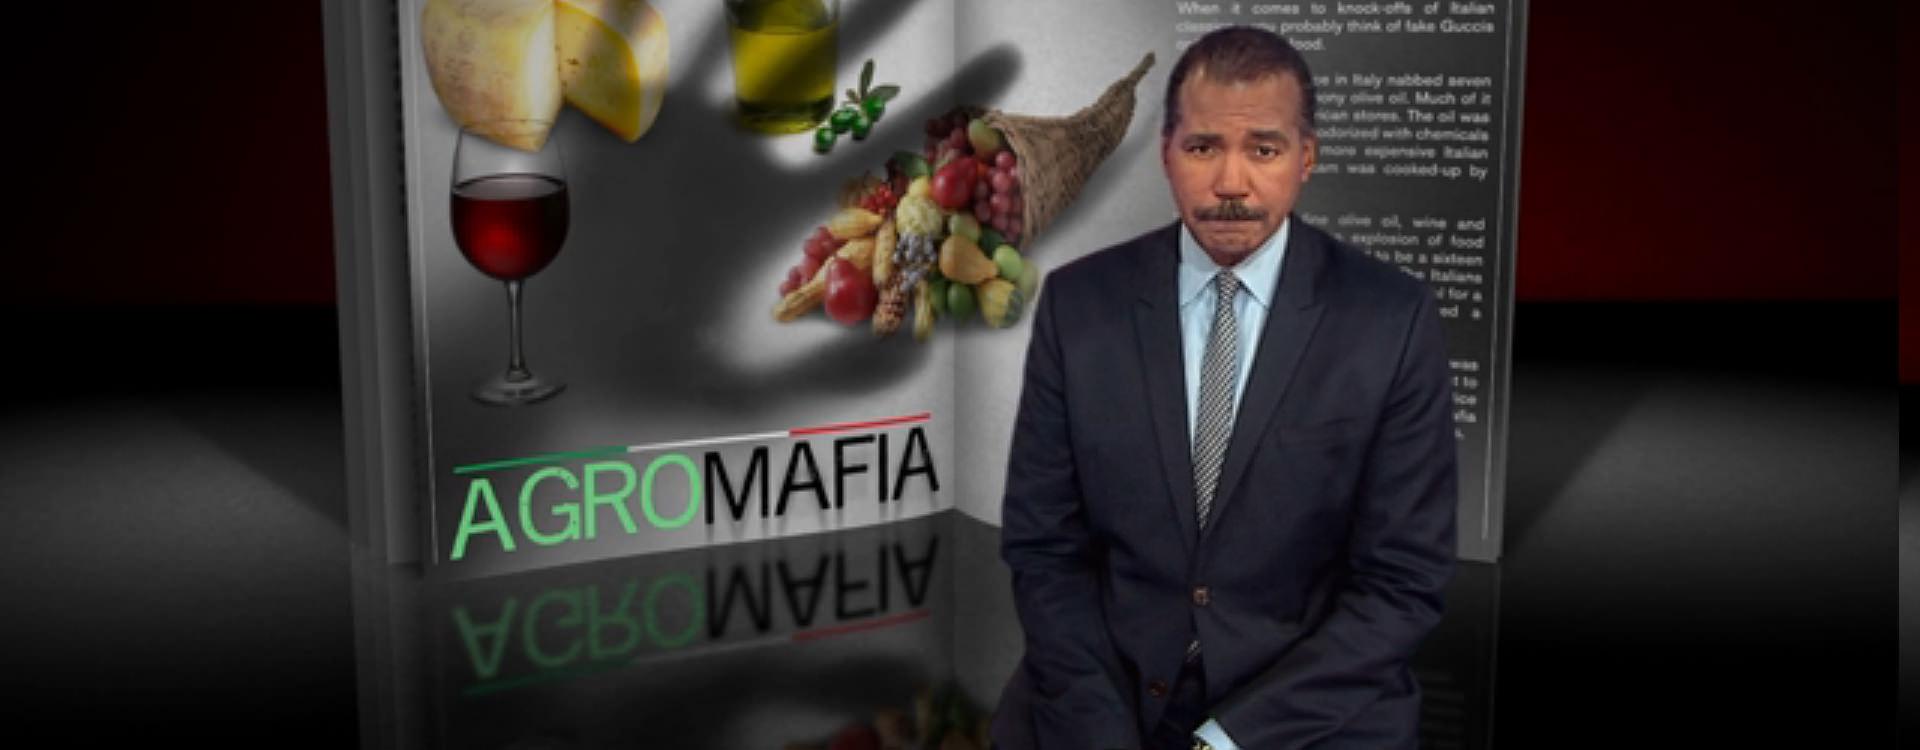 Image result for pics of olive oil in mafia trade